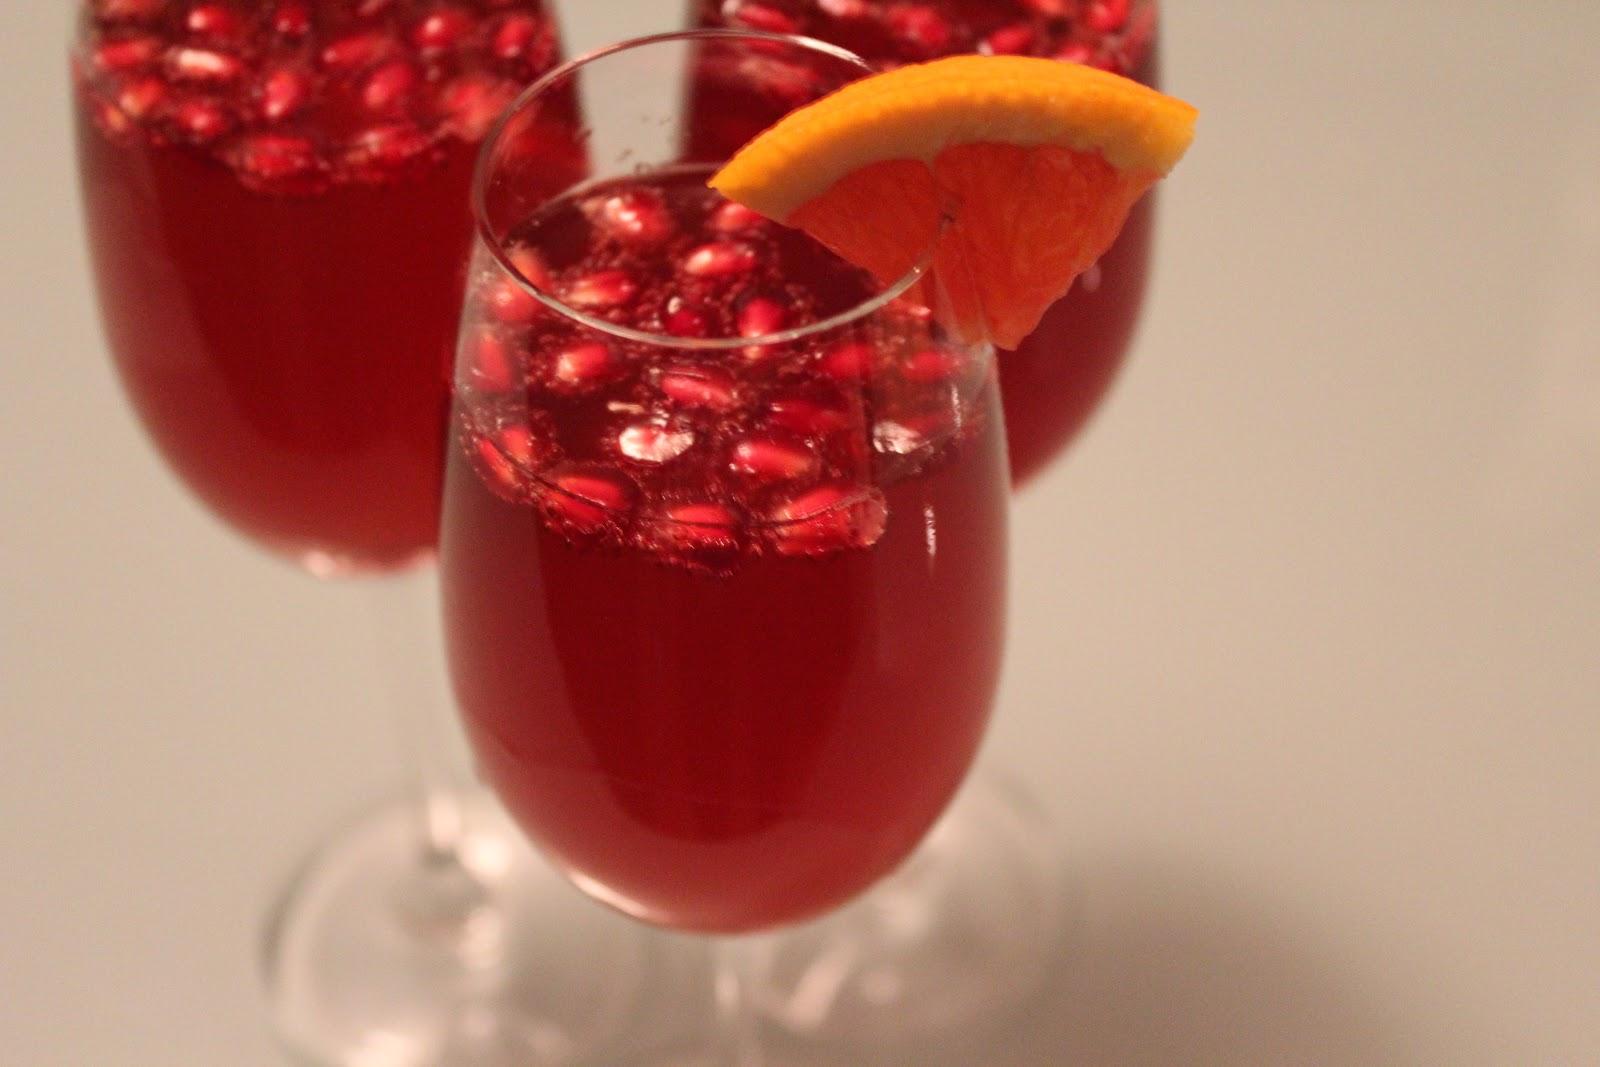 Pomegranate sparklers